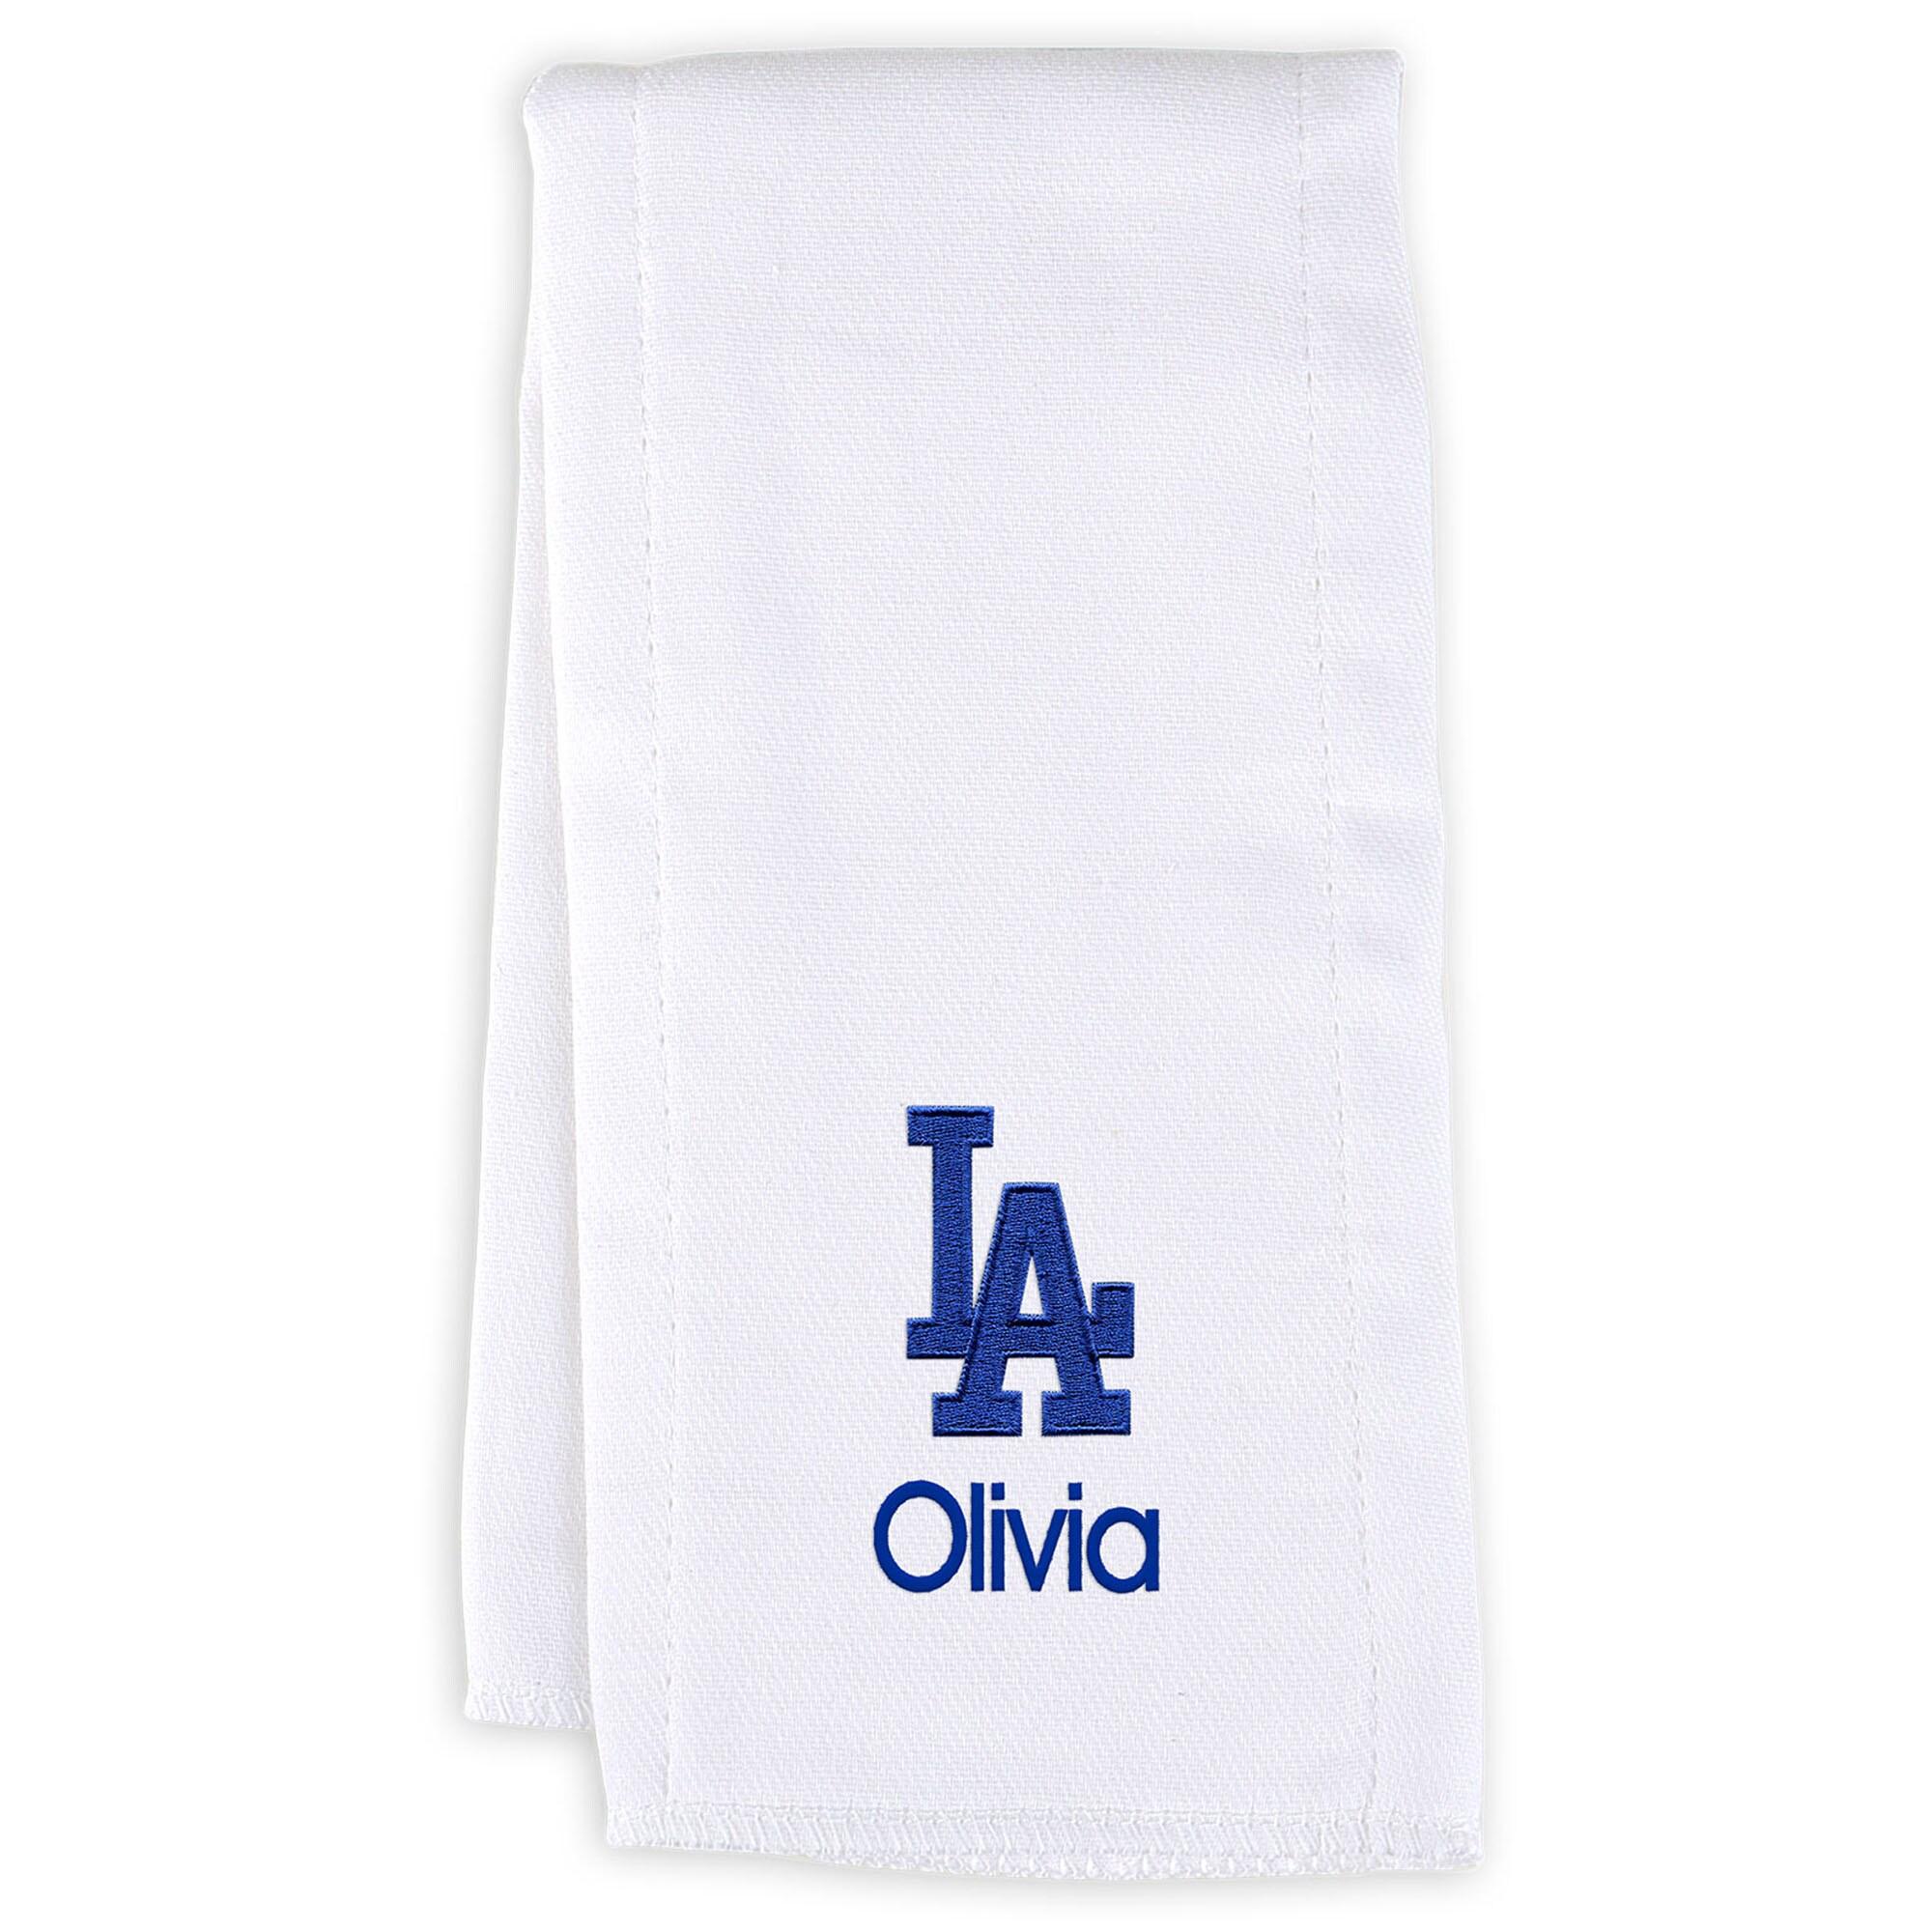 Los Angeles Dodgers Infant Personalized Burp Cloth - White